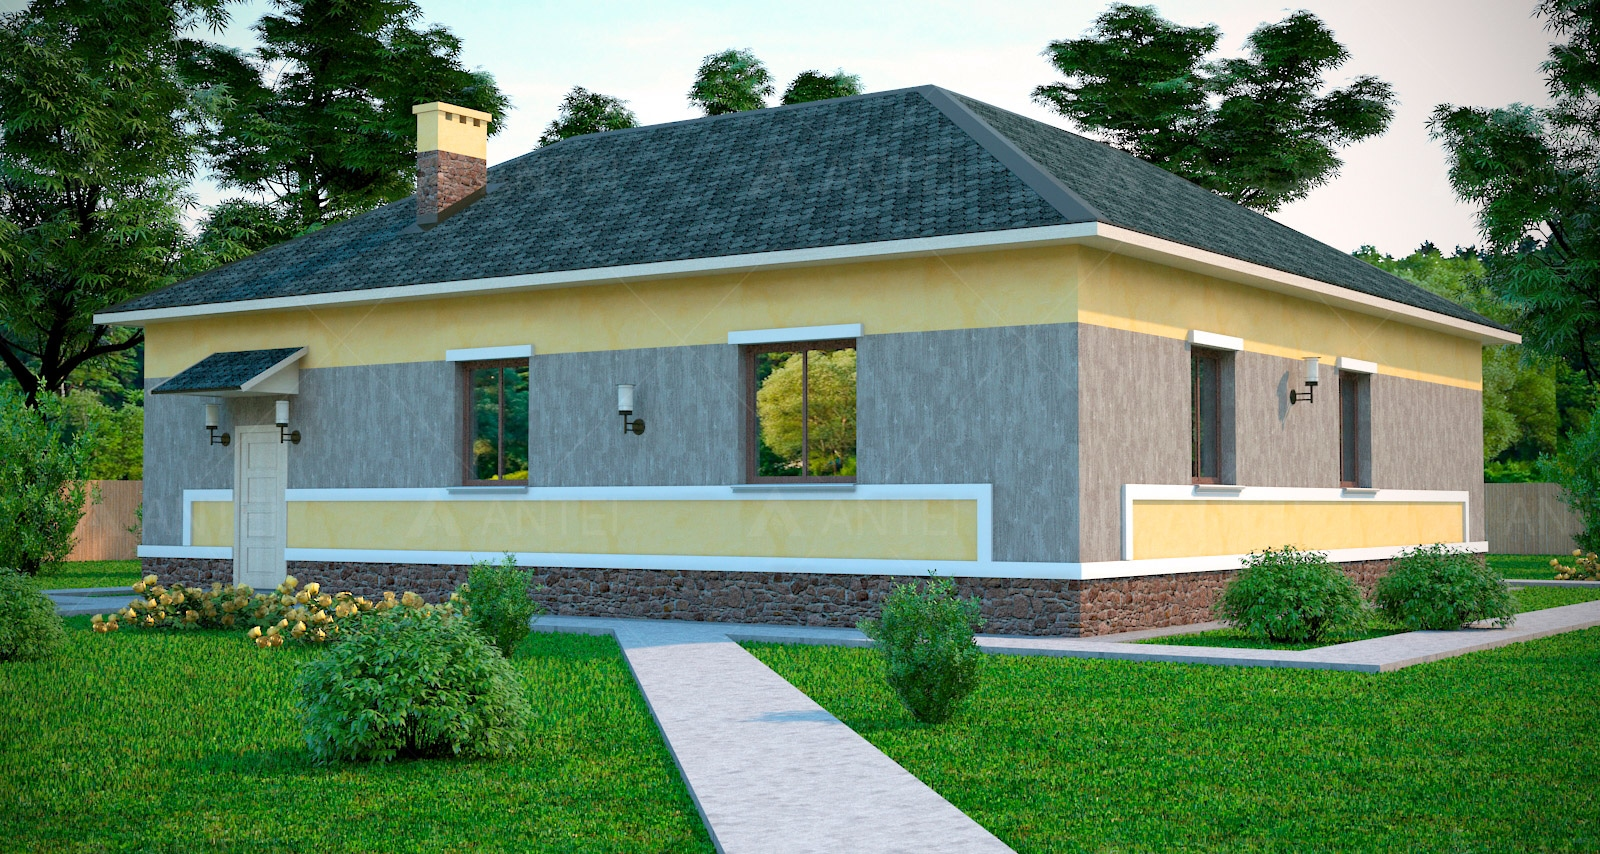 Проект одноэтажного дома с гаражом «КО-45» - фото №2